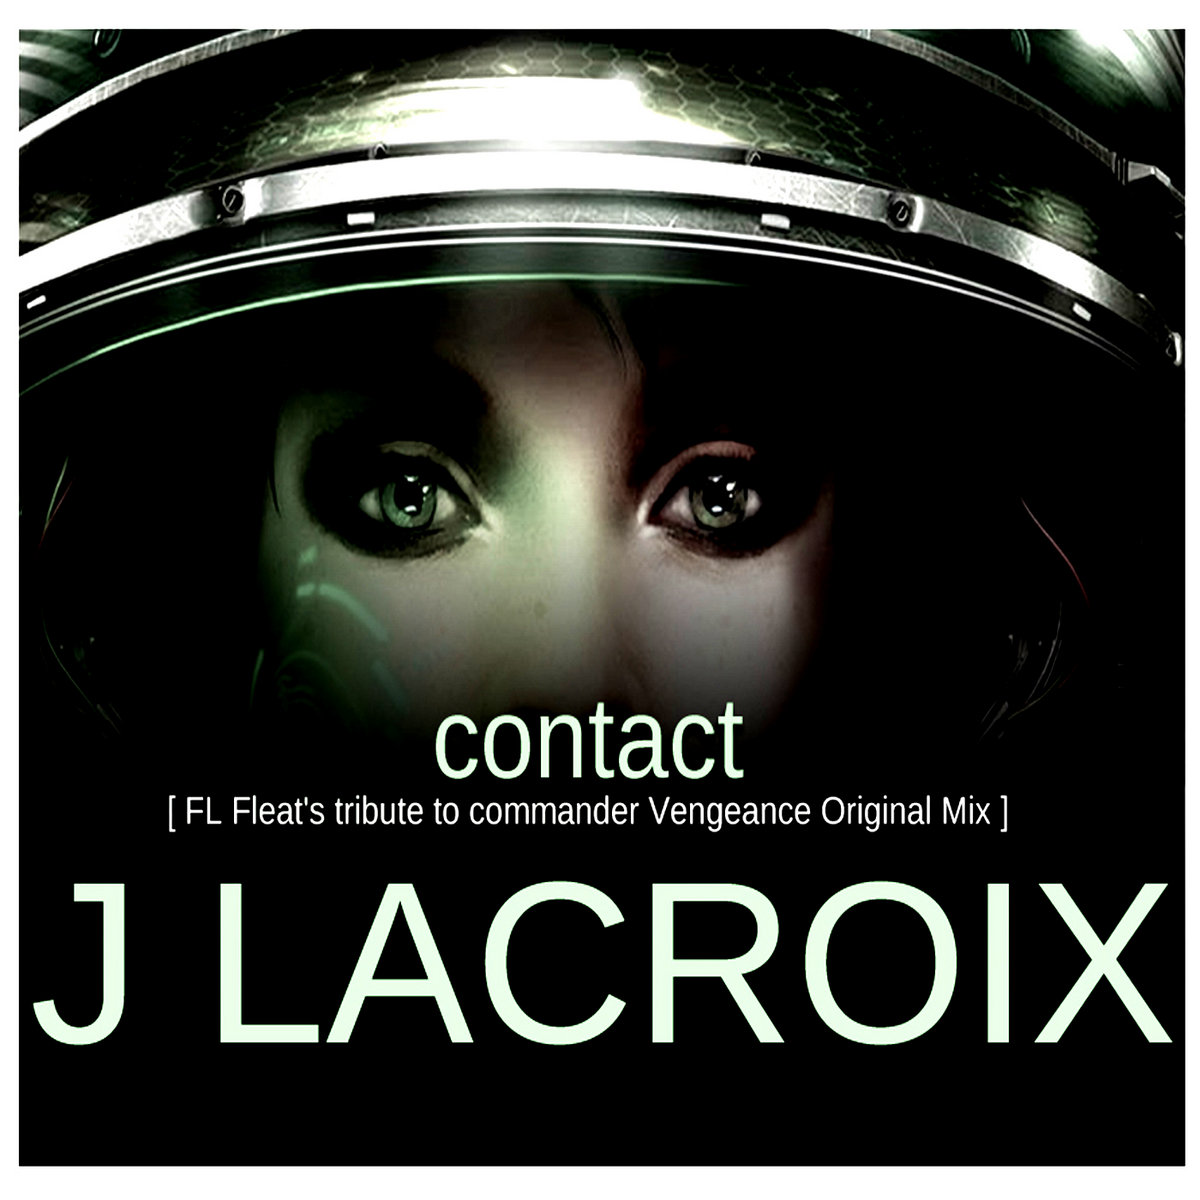 Contact Fl Fleat S Close Encounters Of The Third Kind Re Arrangement Jean Lacroix Fin